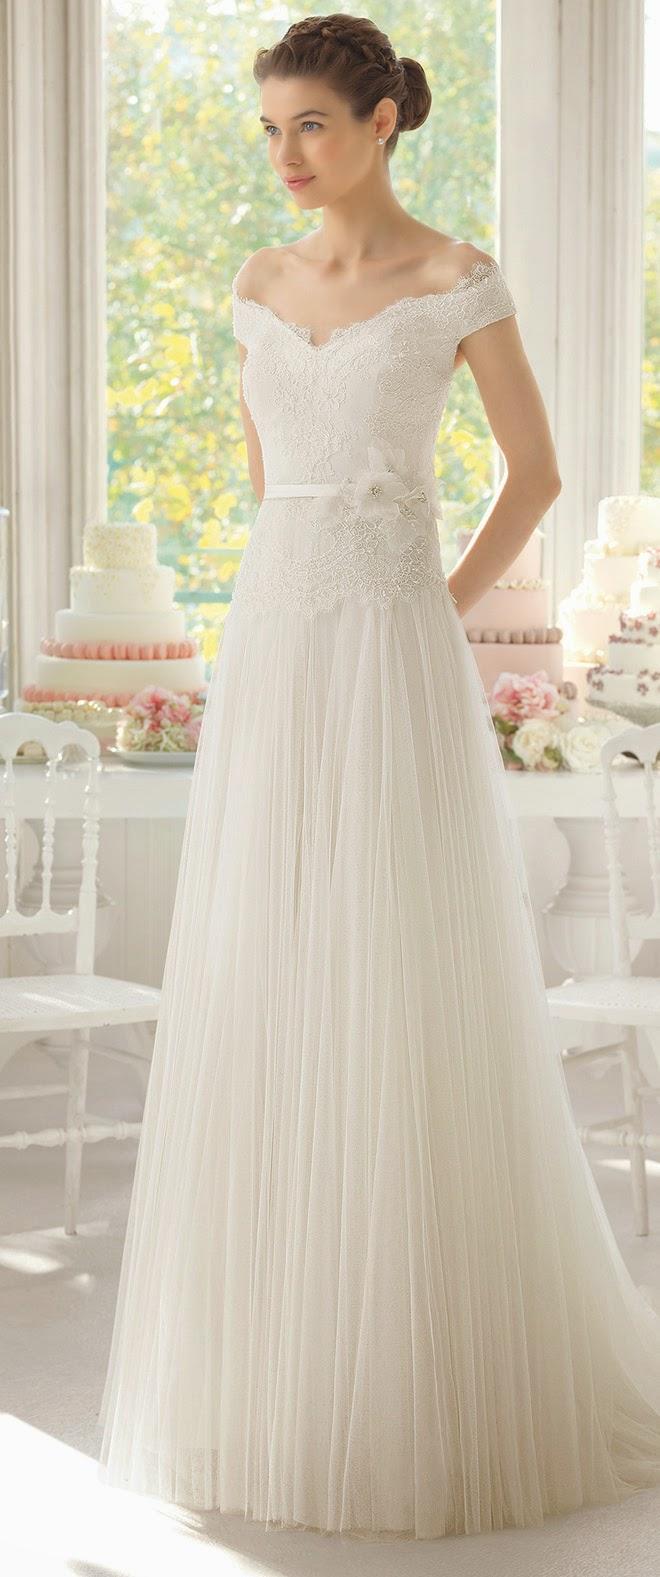 Fifties Wedding Dresses 89 Best Please contact Aire Barcelona